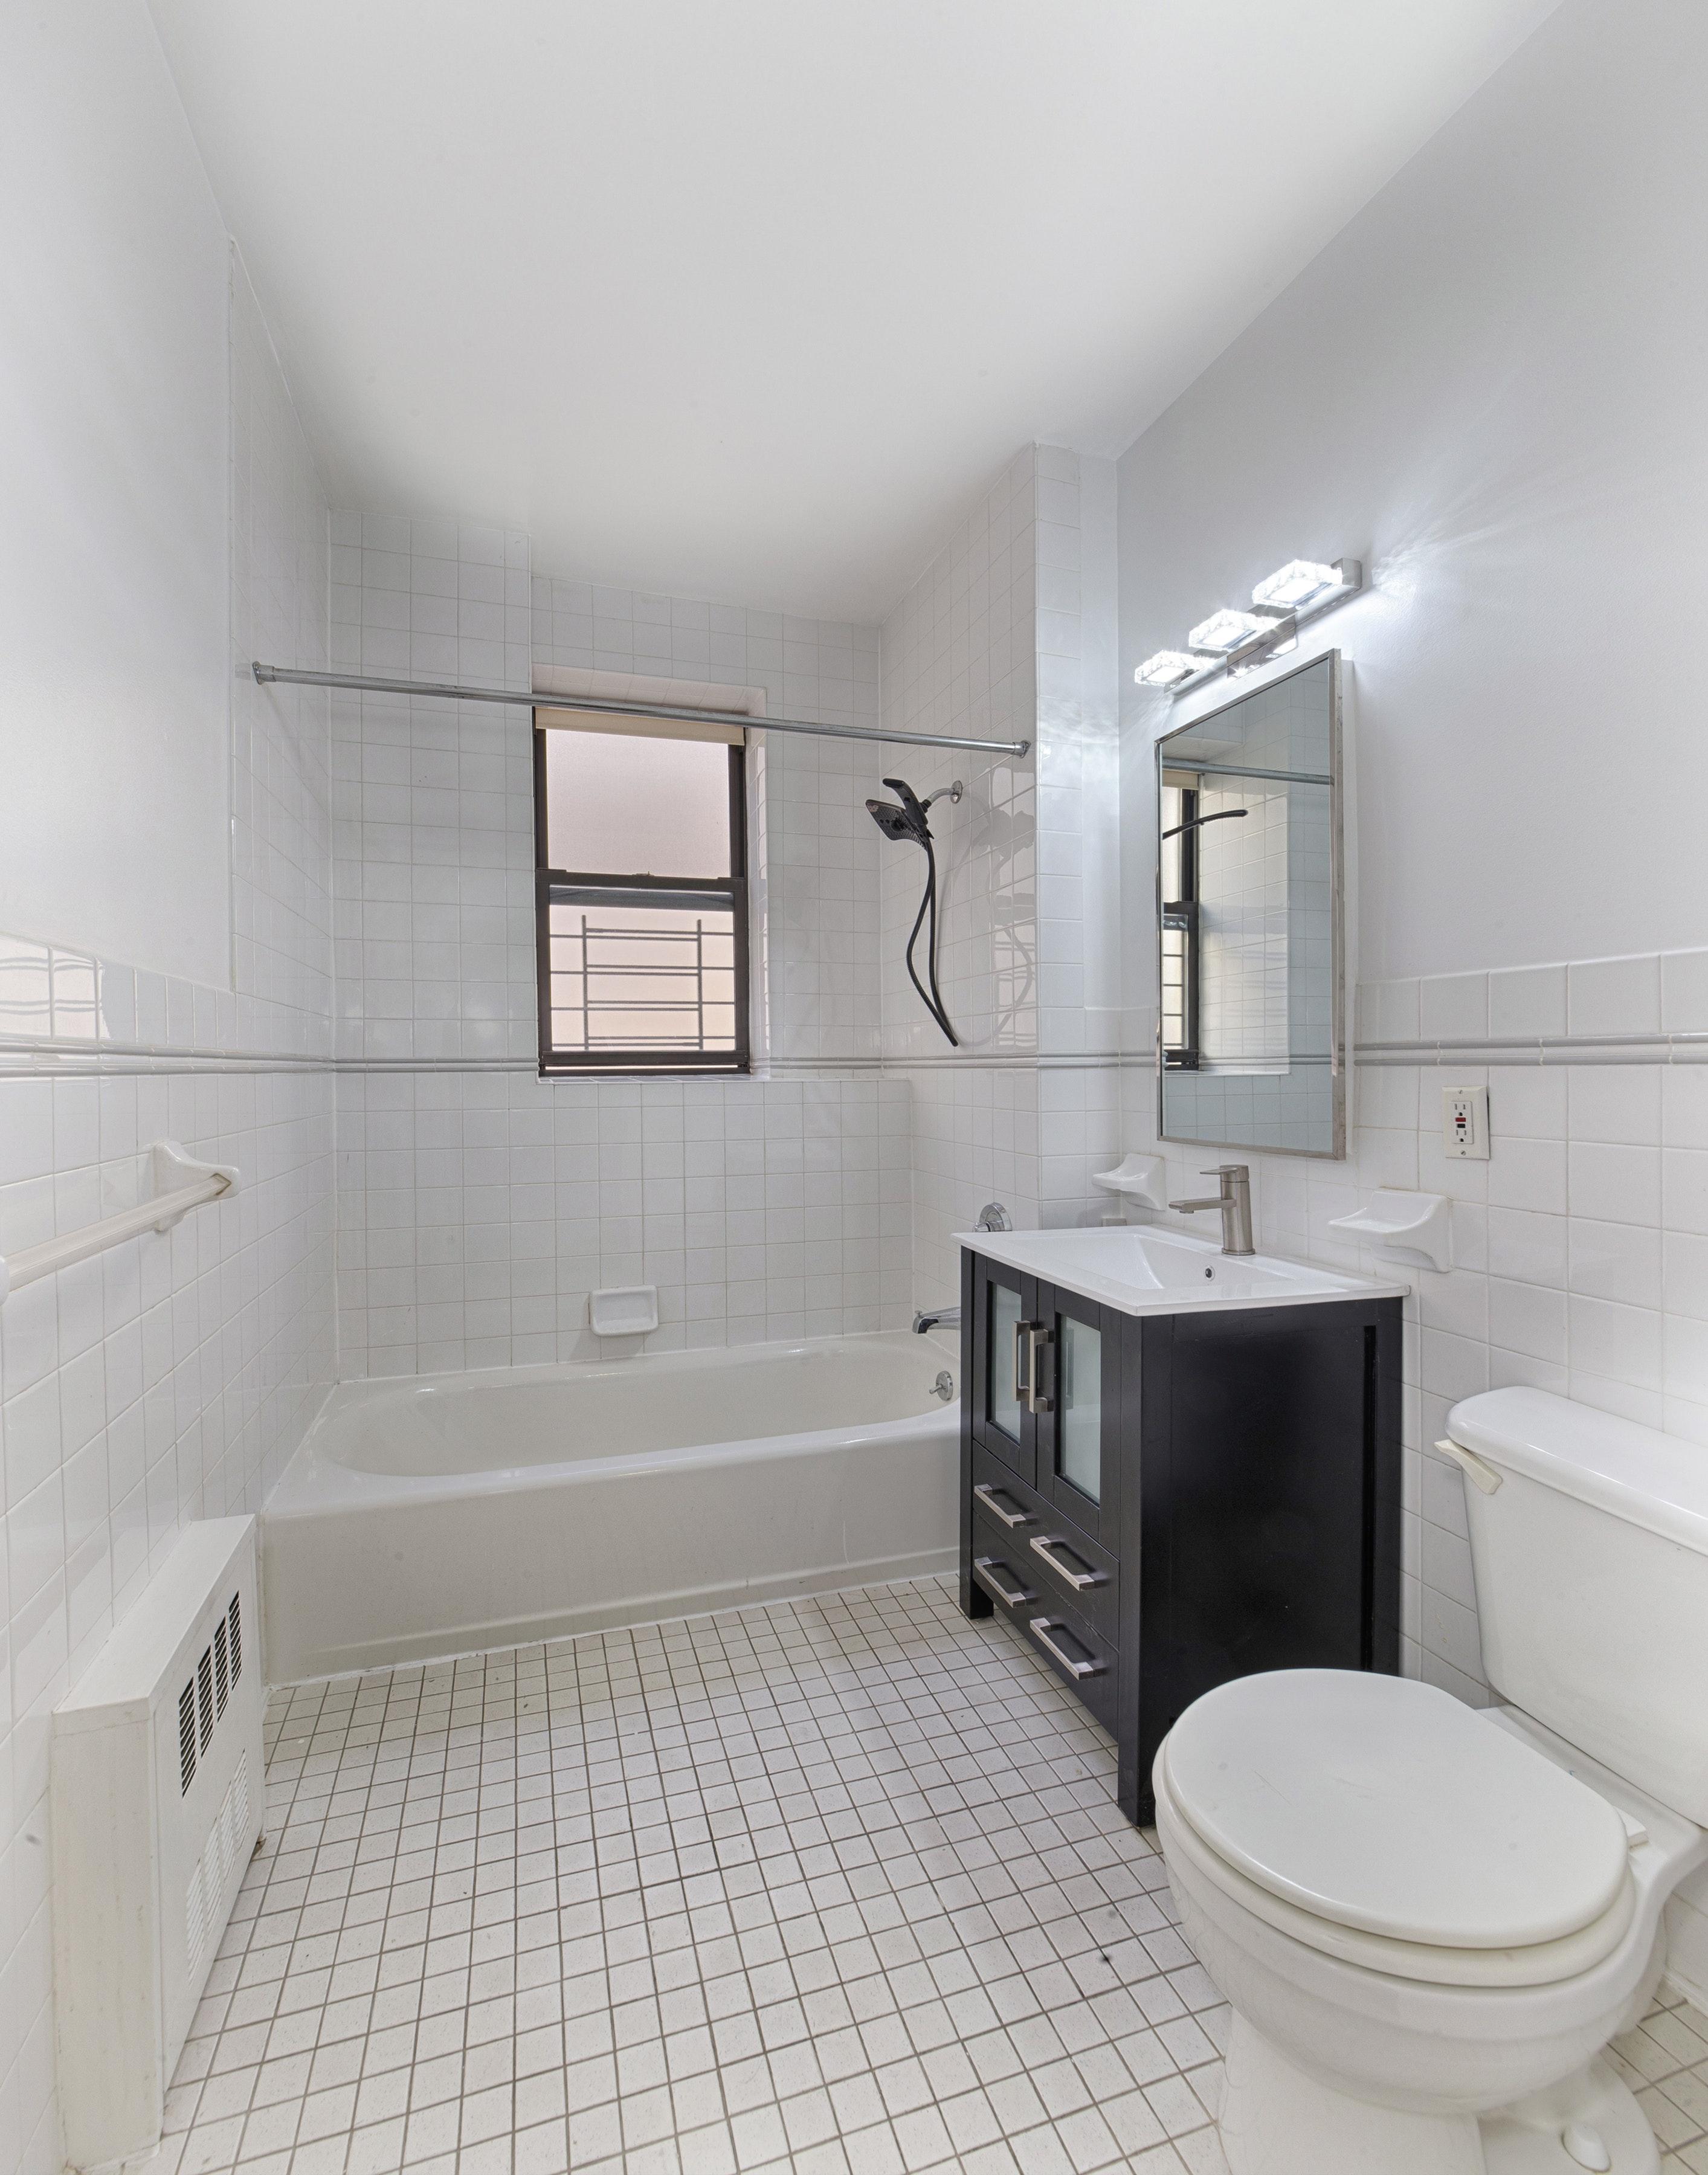 54 East 129th Street 6a 6a, New York, NY - USA (photo 4)